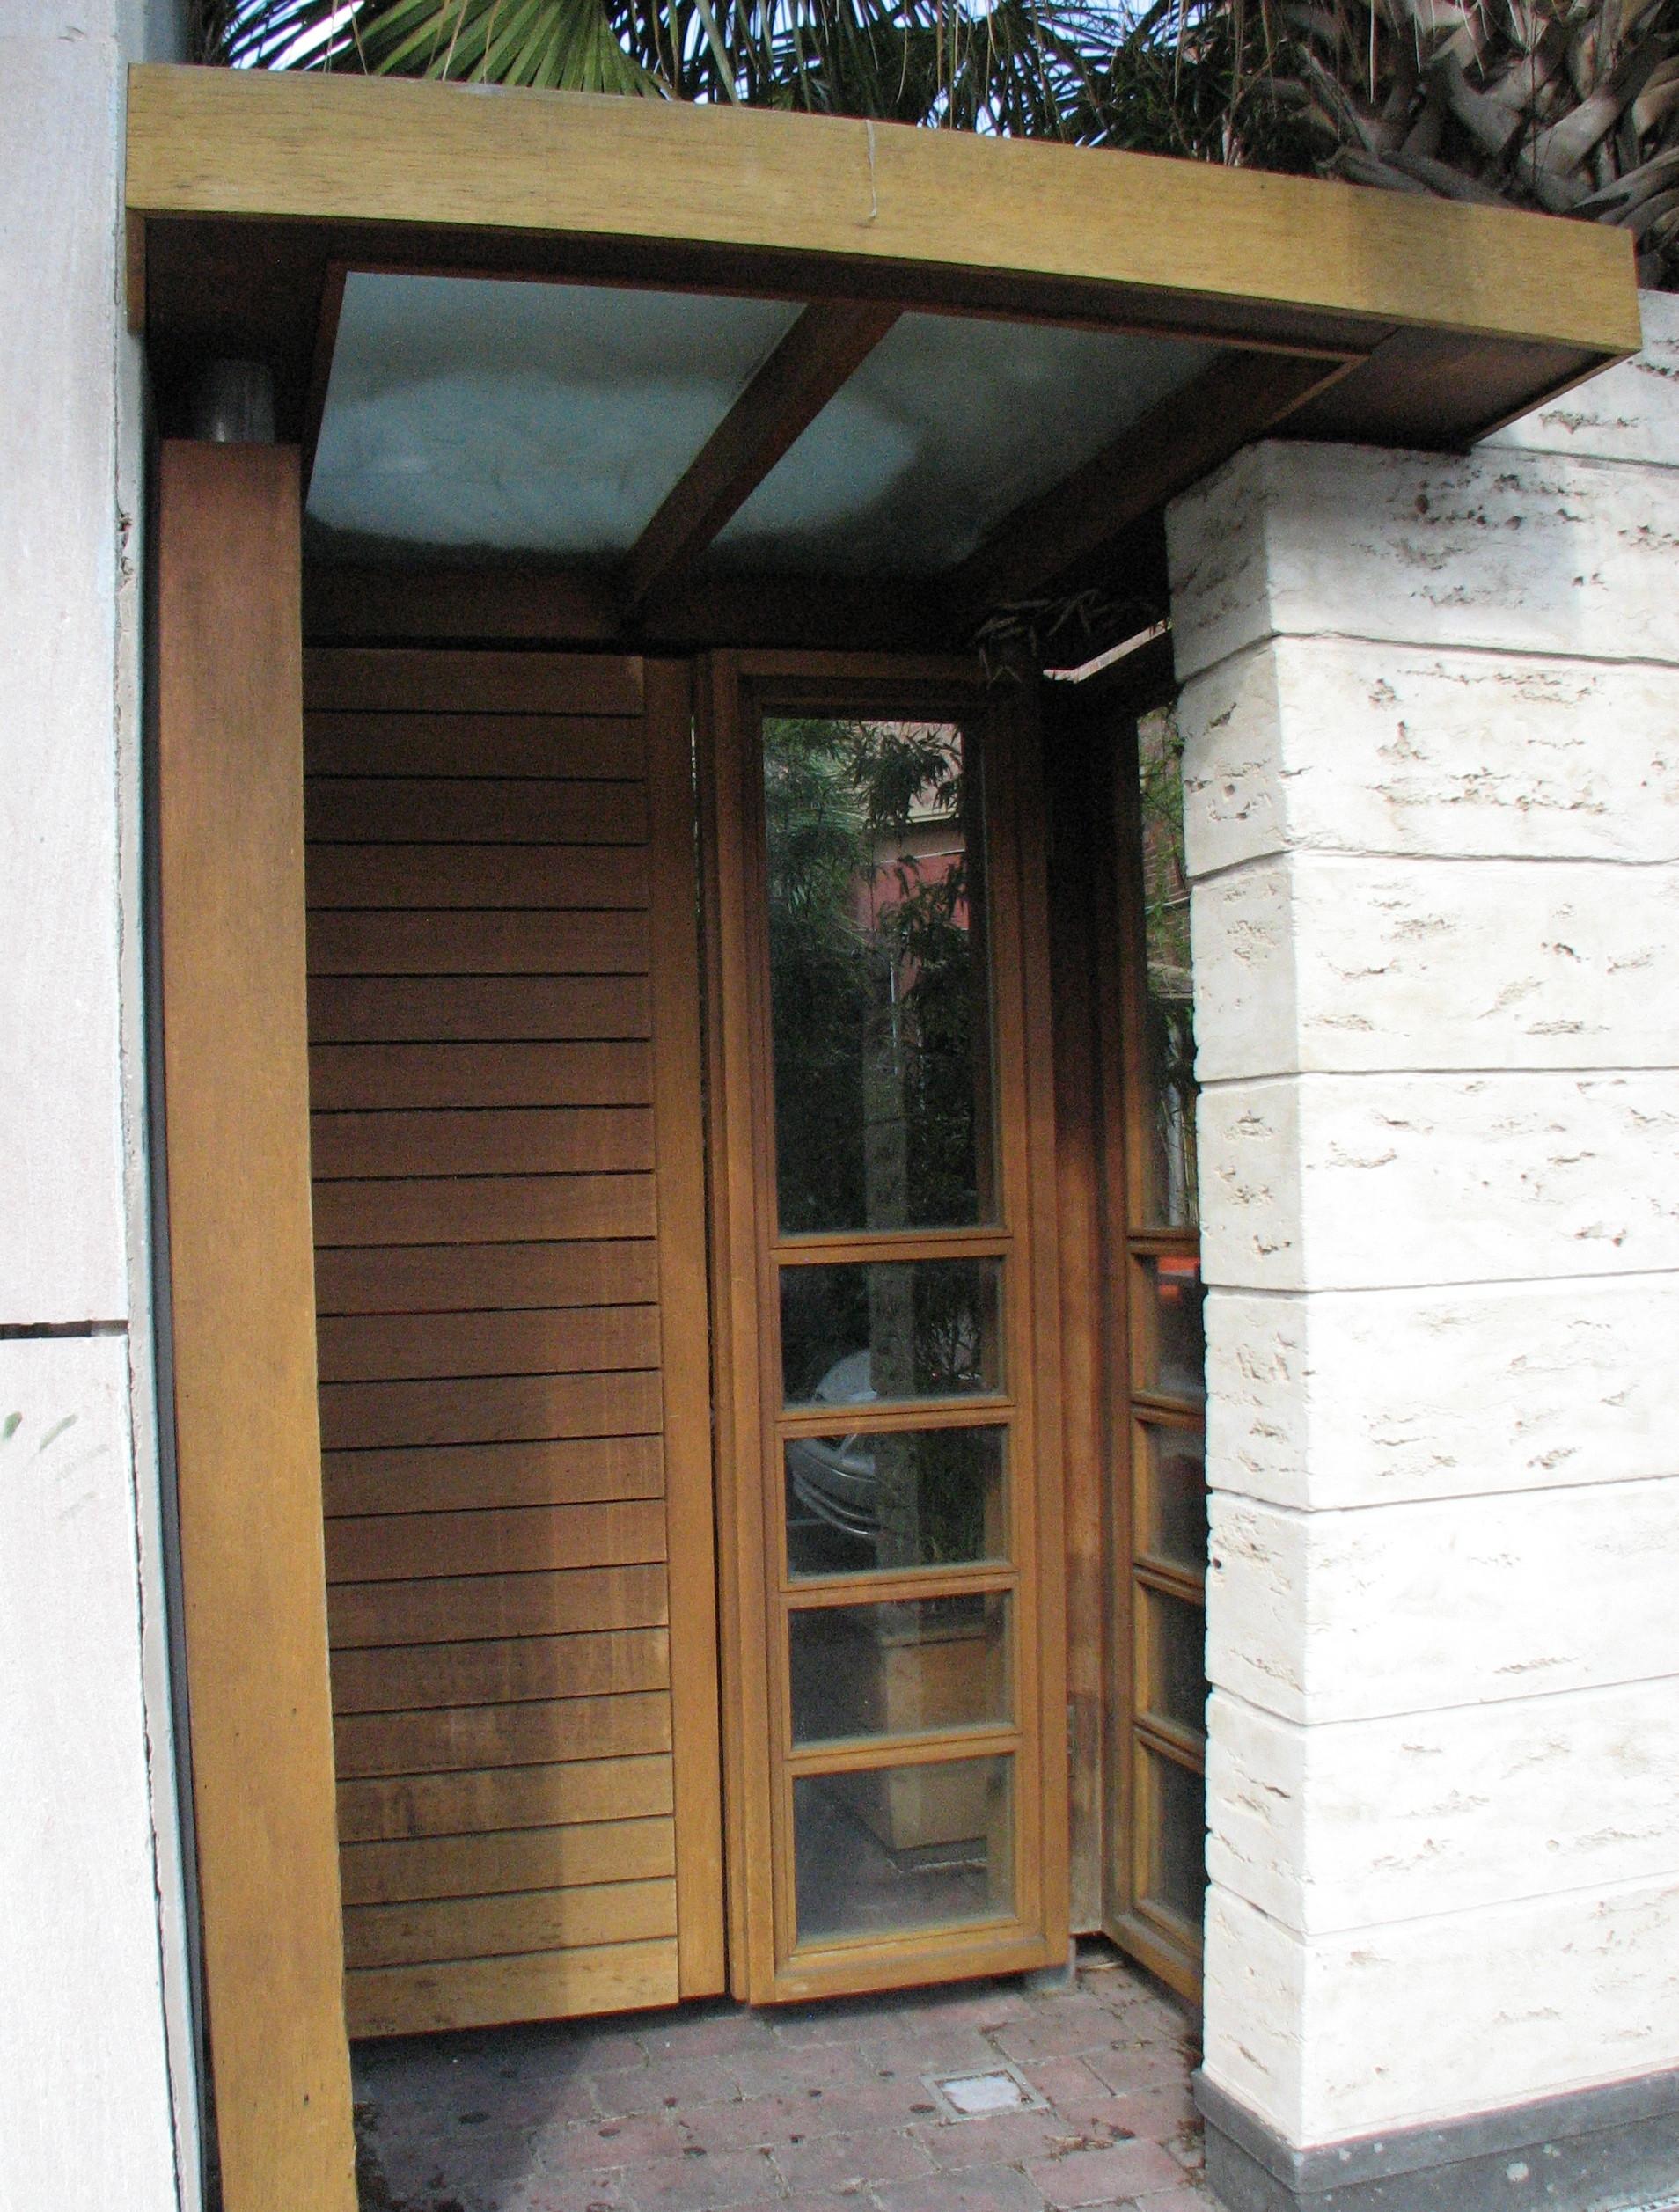 Chai's Courtyard and Lounge